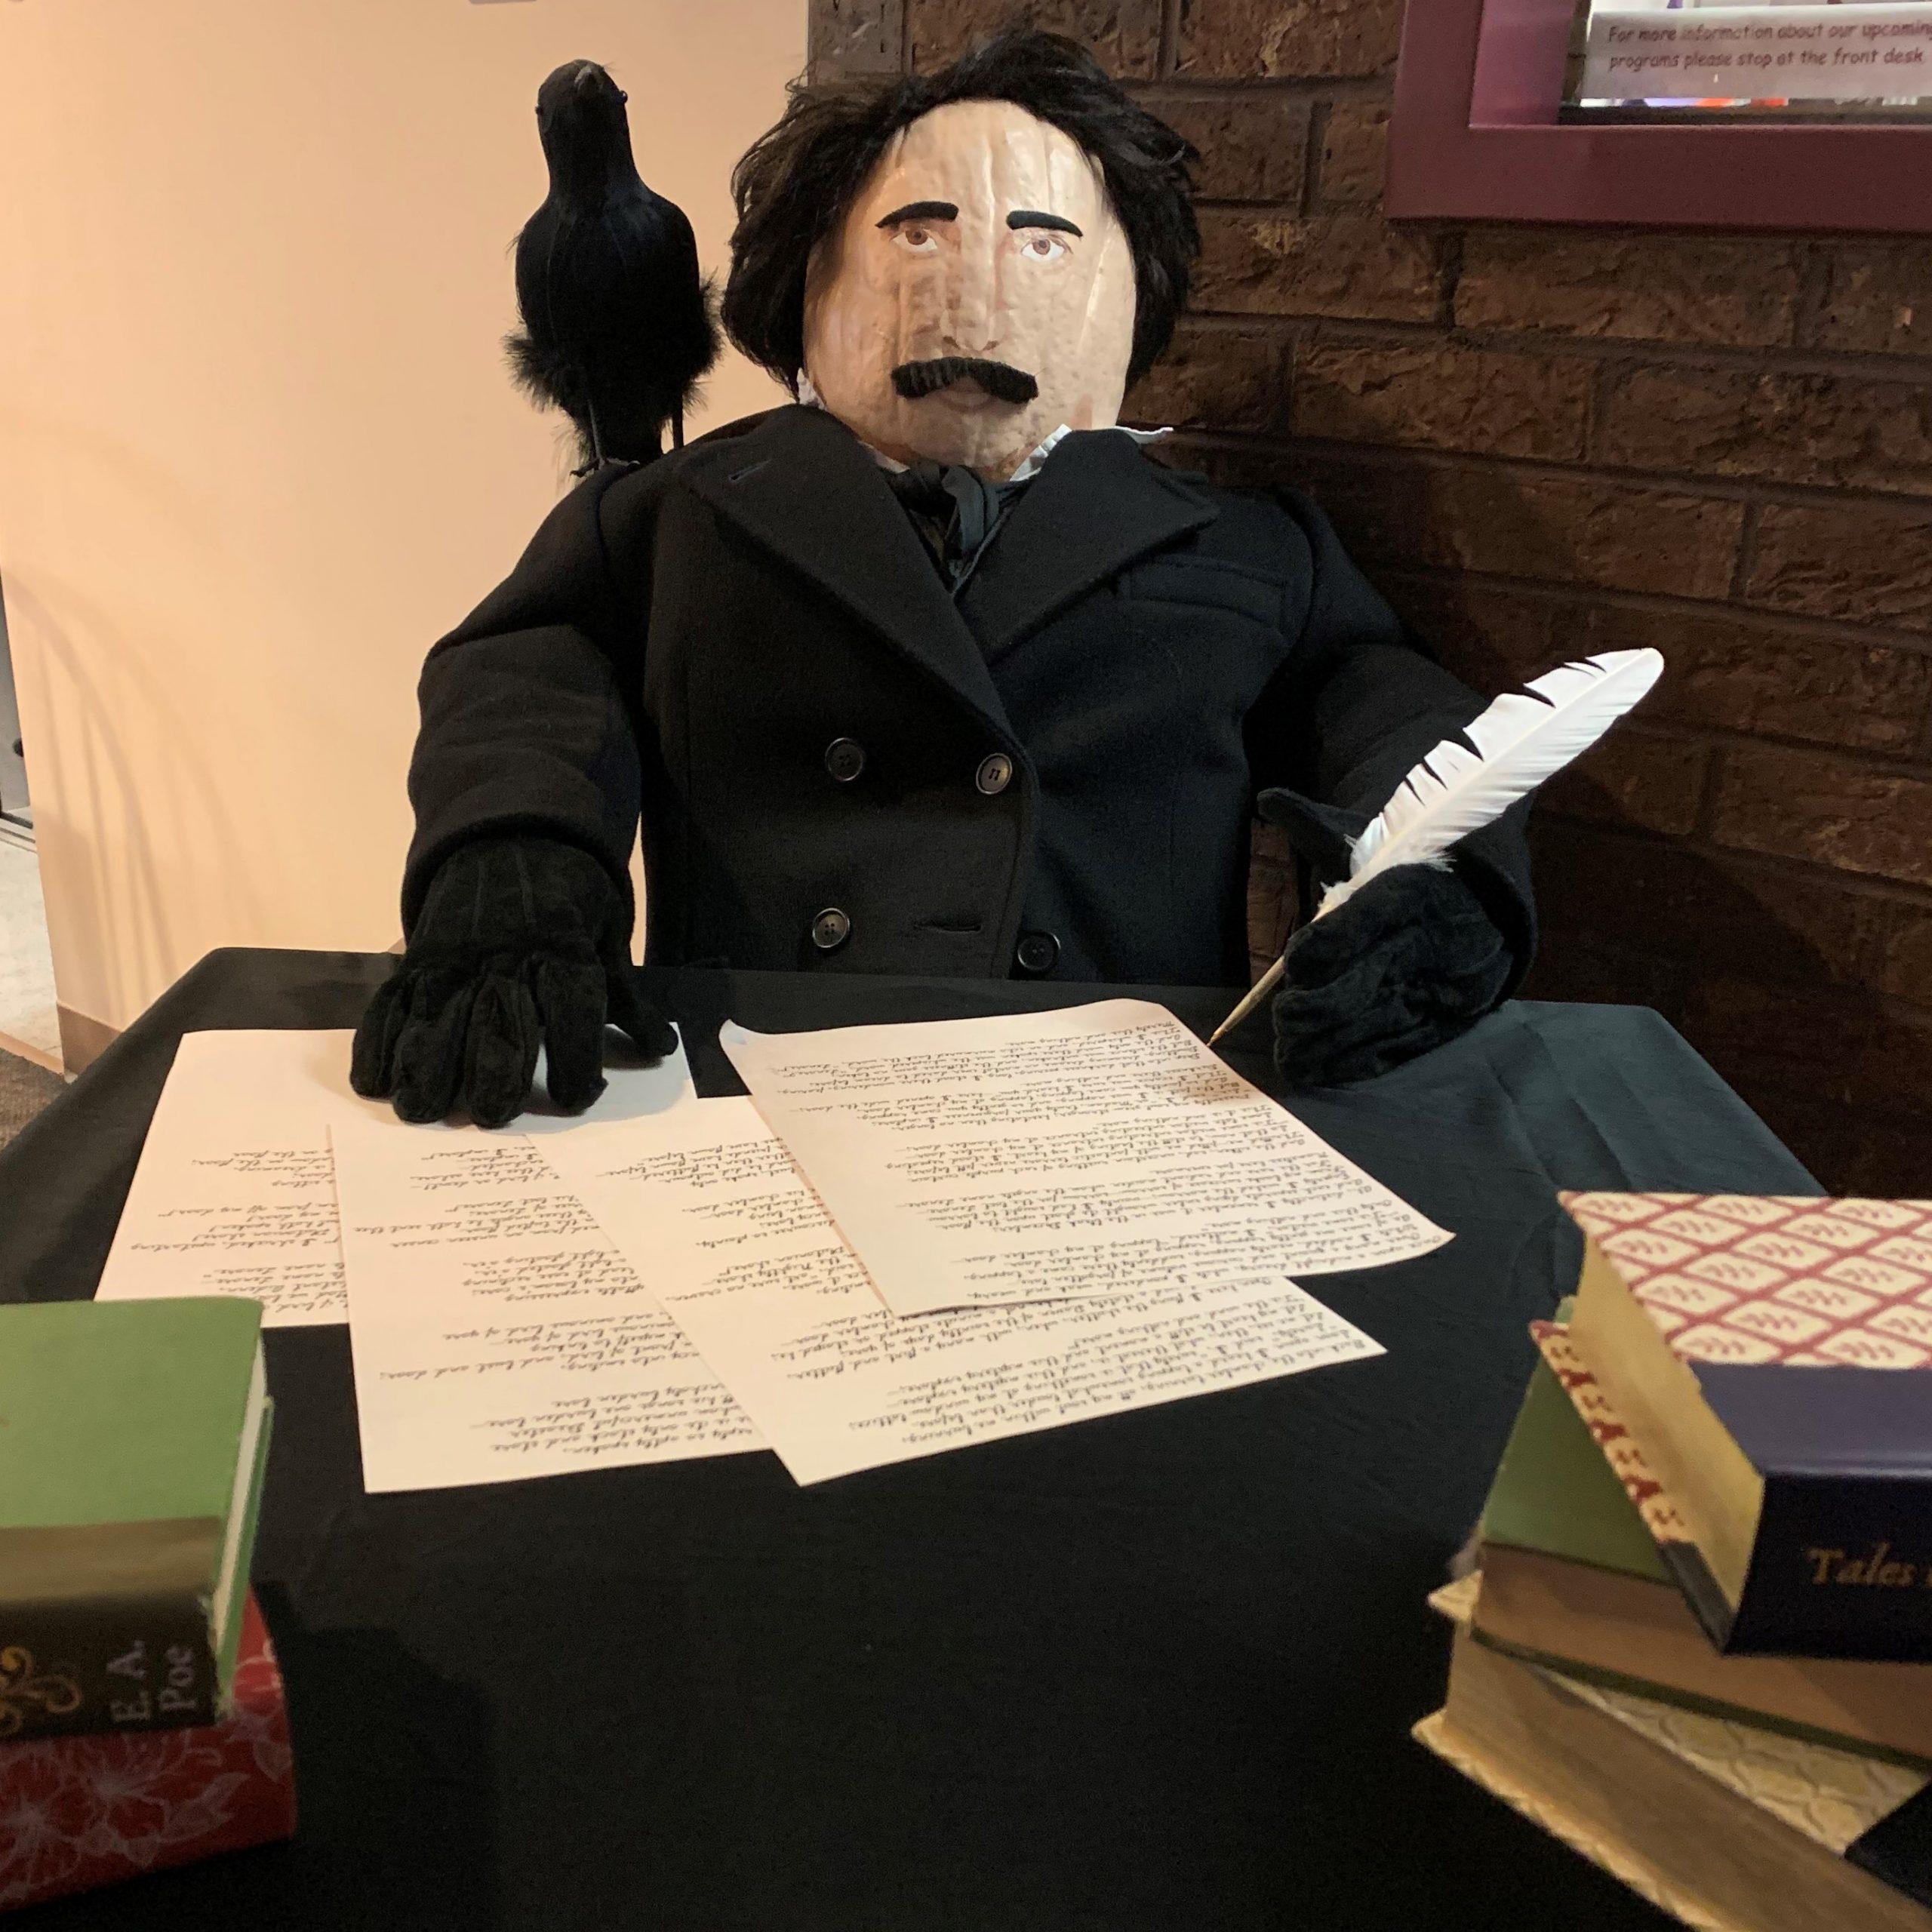 Say hello to Edgar Allan Poempkin!